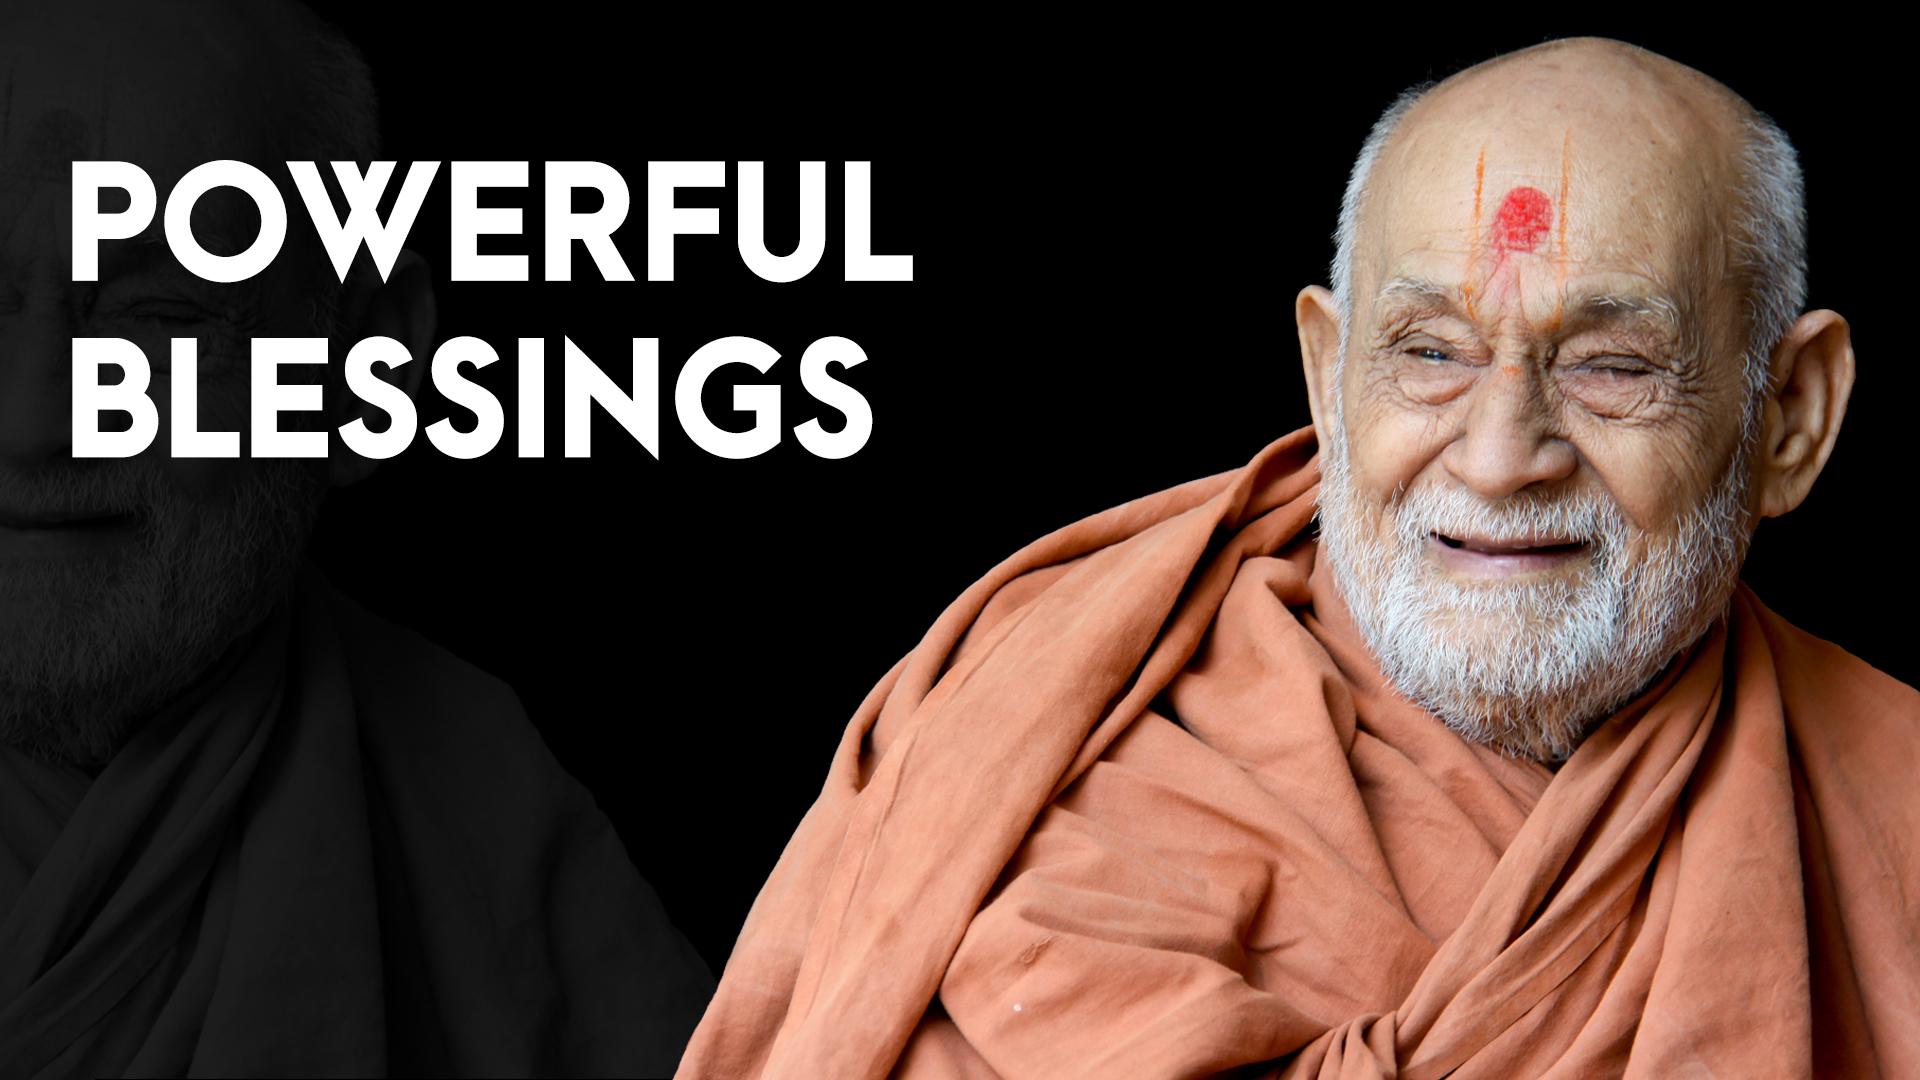 Vachan Siddhi Purush | Gurudev HDH Bapji | Powerful Blessings